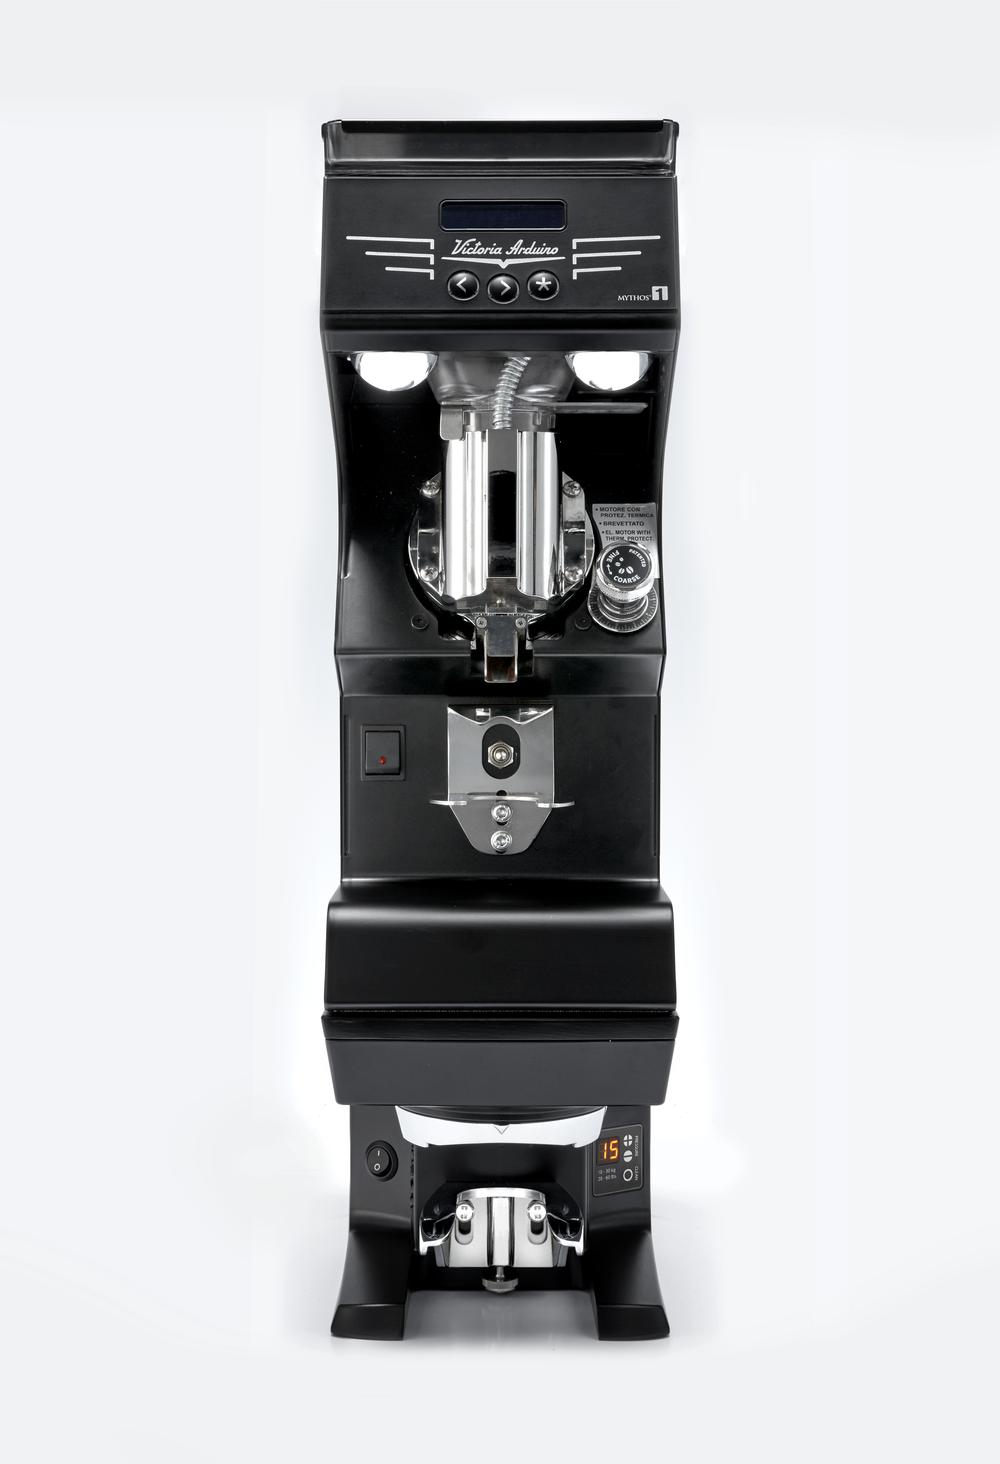 Puqpress M2 - set - front-VA espresso machines Mythos One Victoria Arduino.png